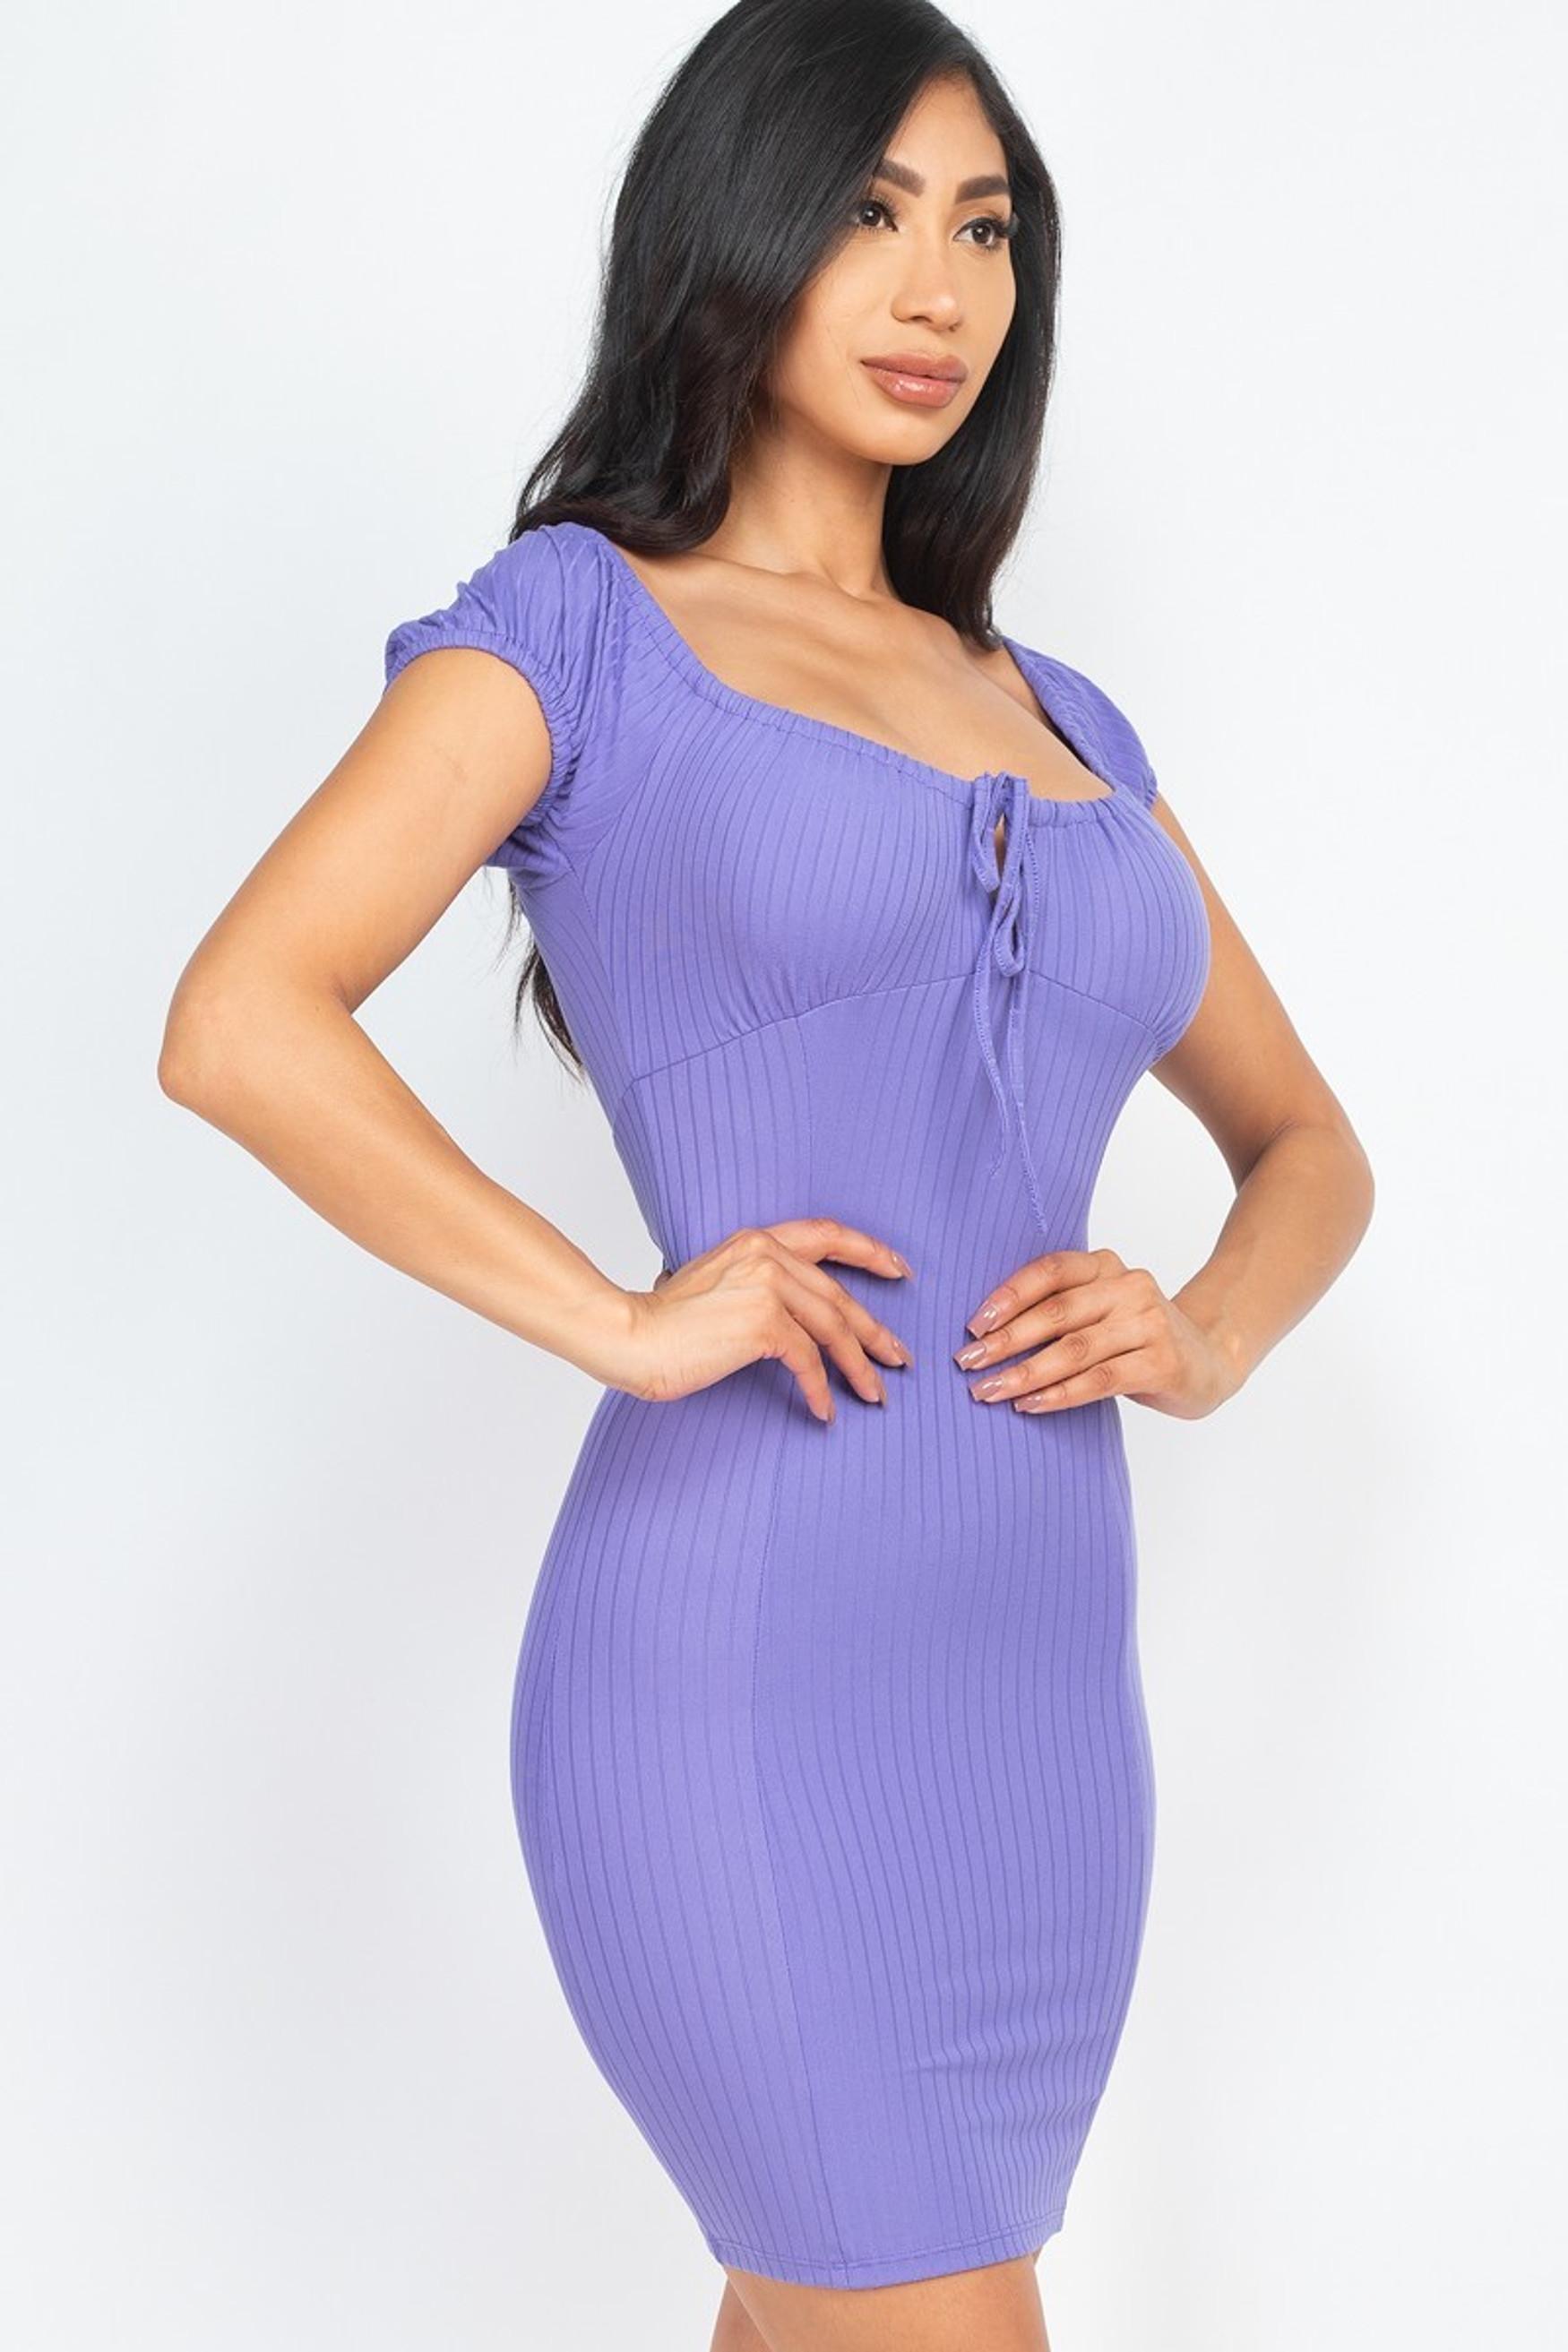 Off the Shoulder Rib Knit Tie Front Bodycon Mini Dress